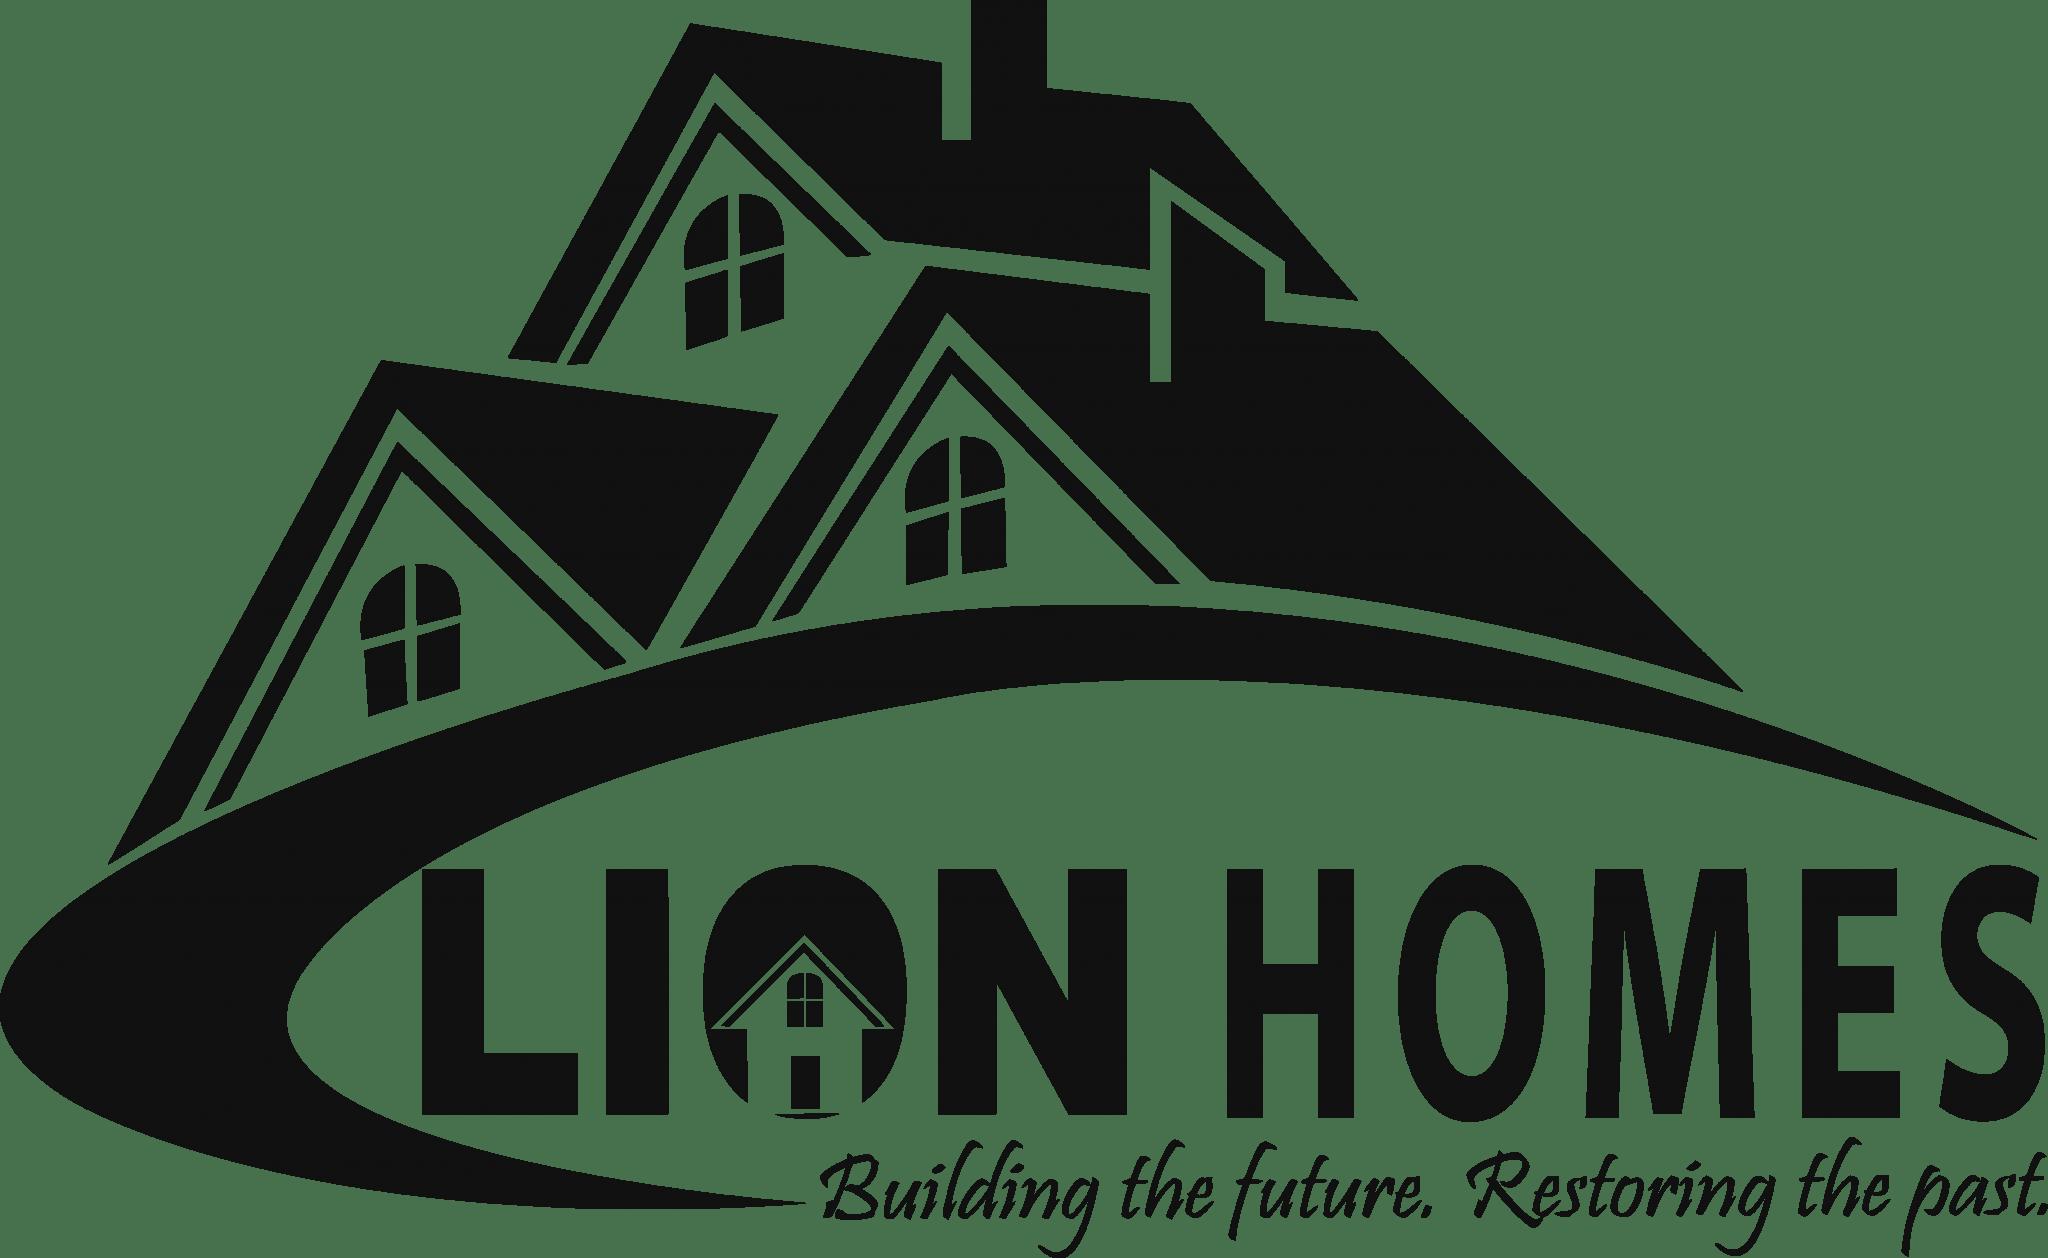 Lion Homes